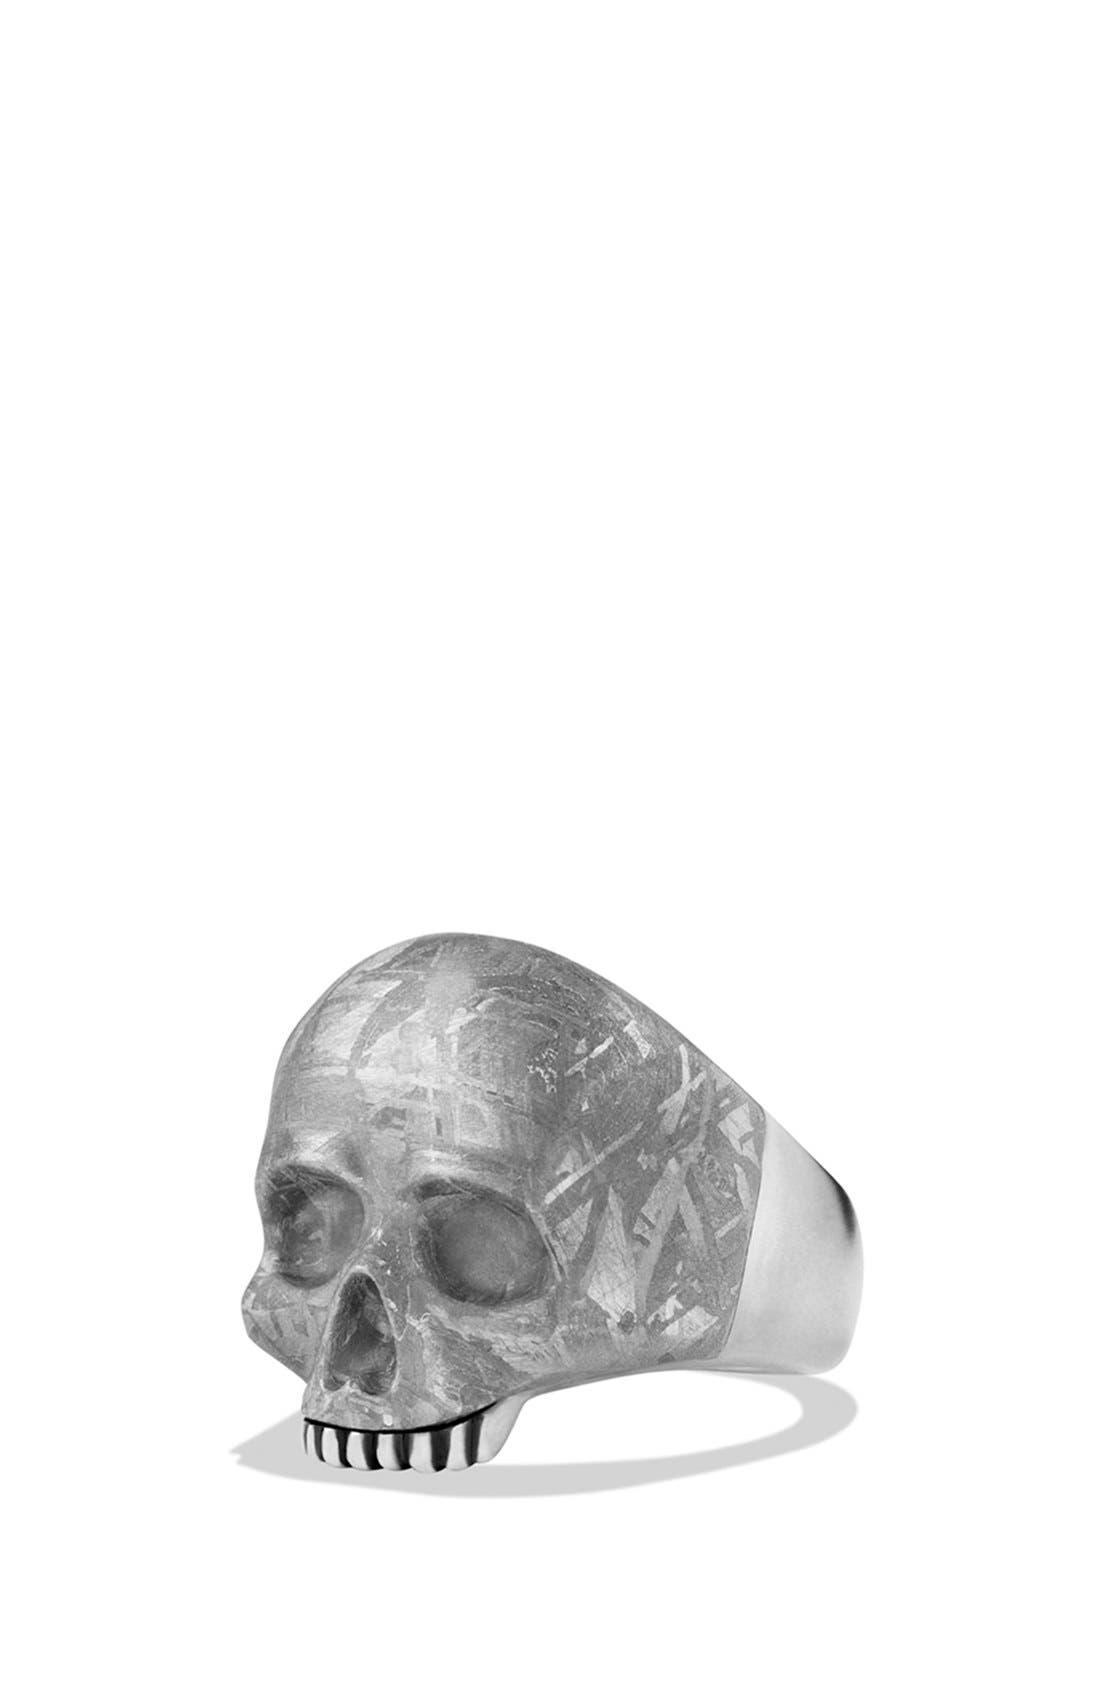 Alternate Image 1 Selected - David Yurman 'Skull' Ring with Carved Meteorite